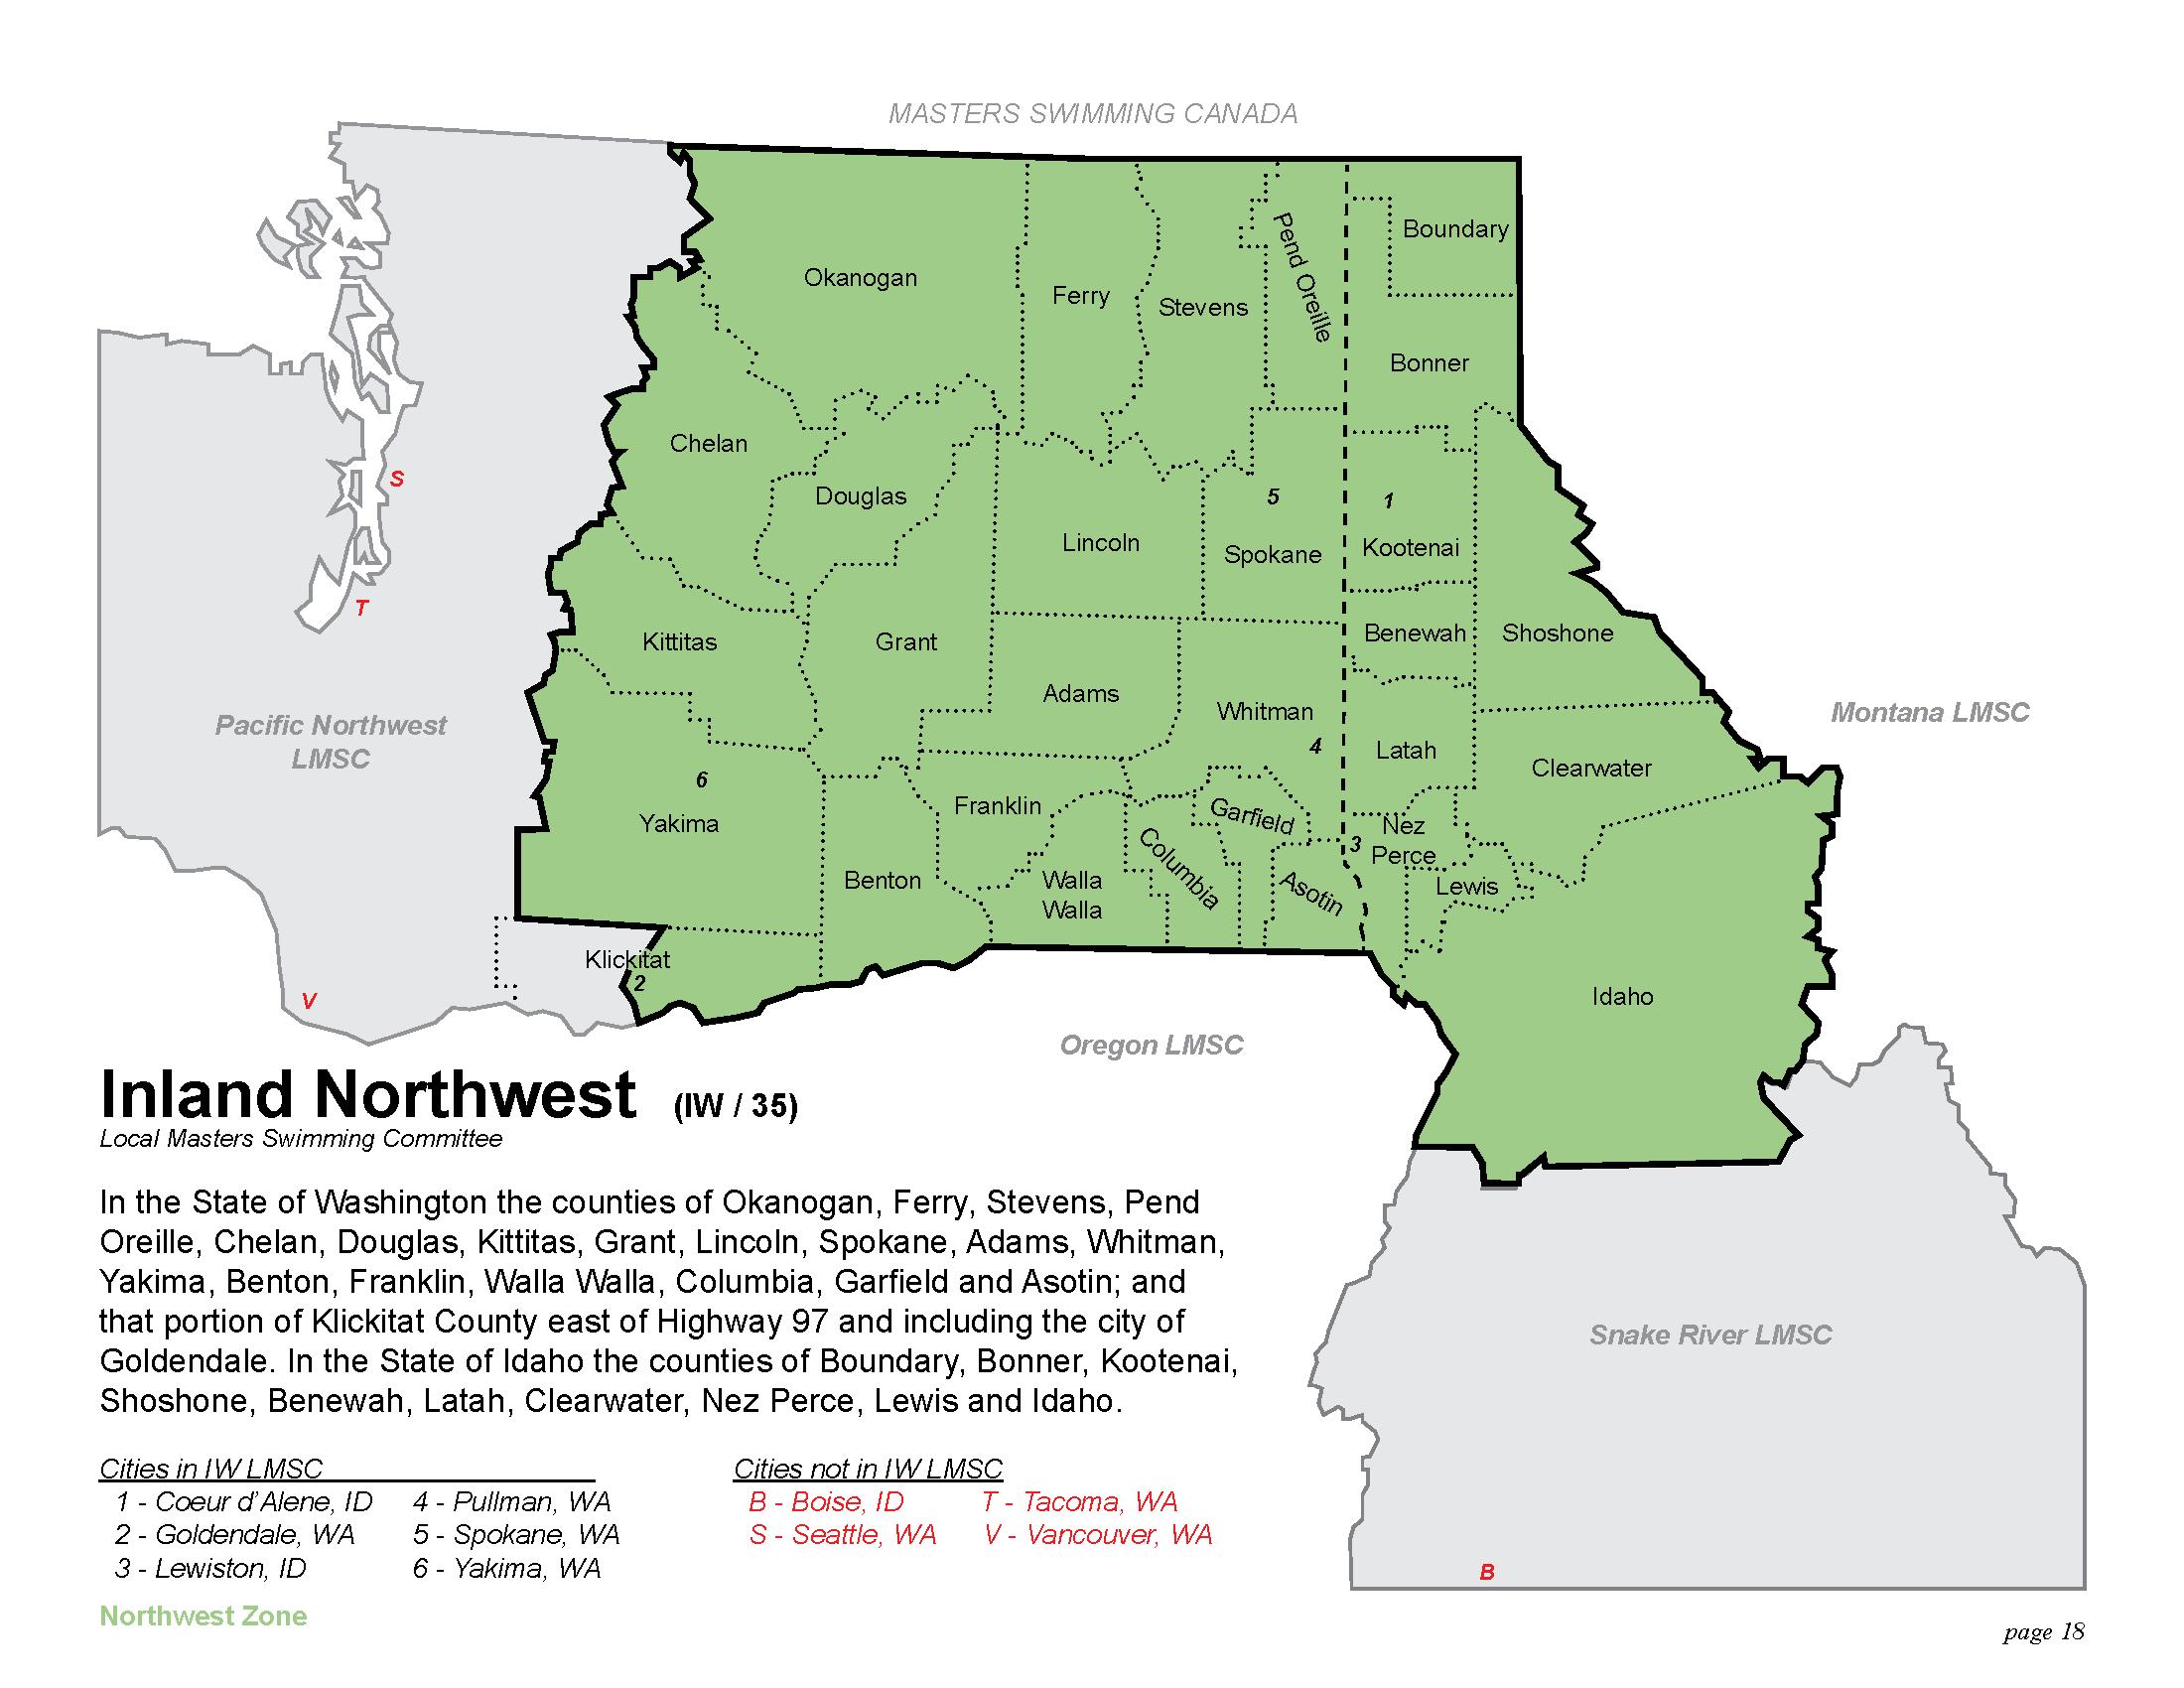 Geographic Region In The State Of Washington The Counties Of Okanogan Chelan Douglas Ferry Stevens Spokane Lincoln Grant Kitas Asotin